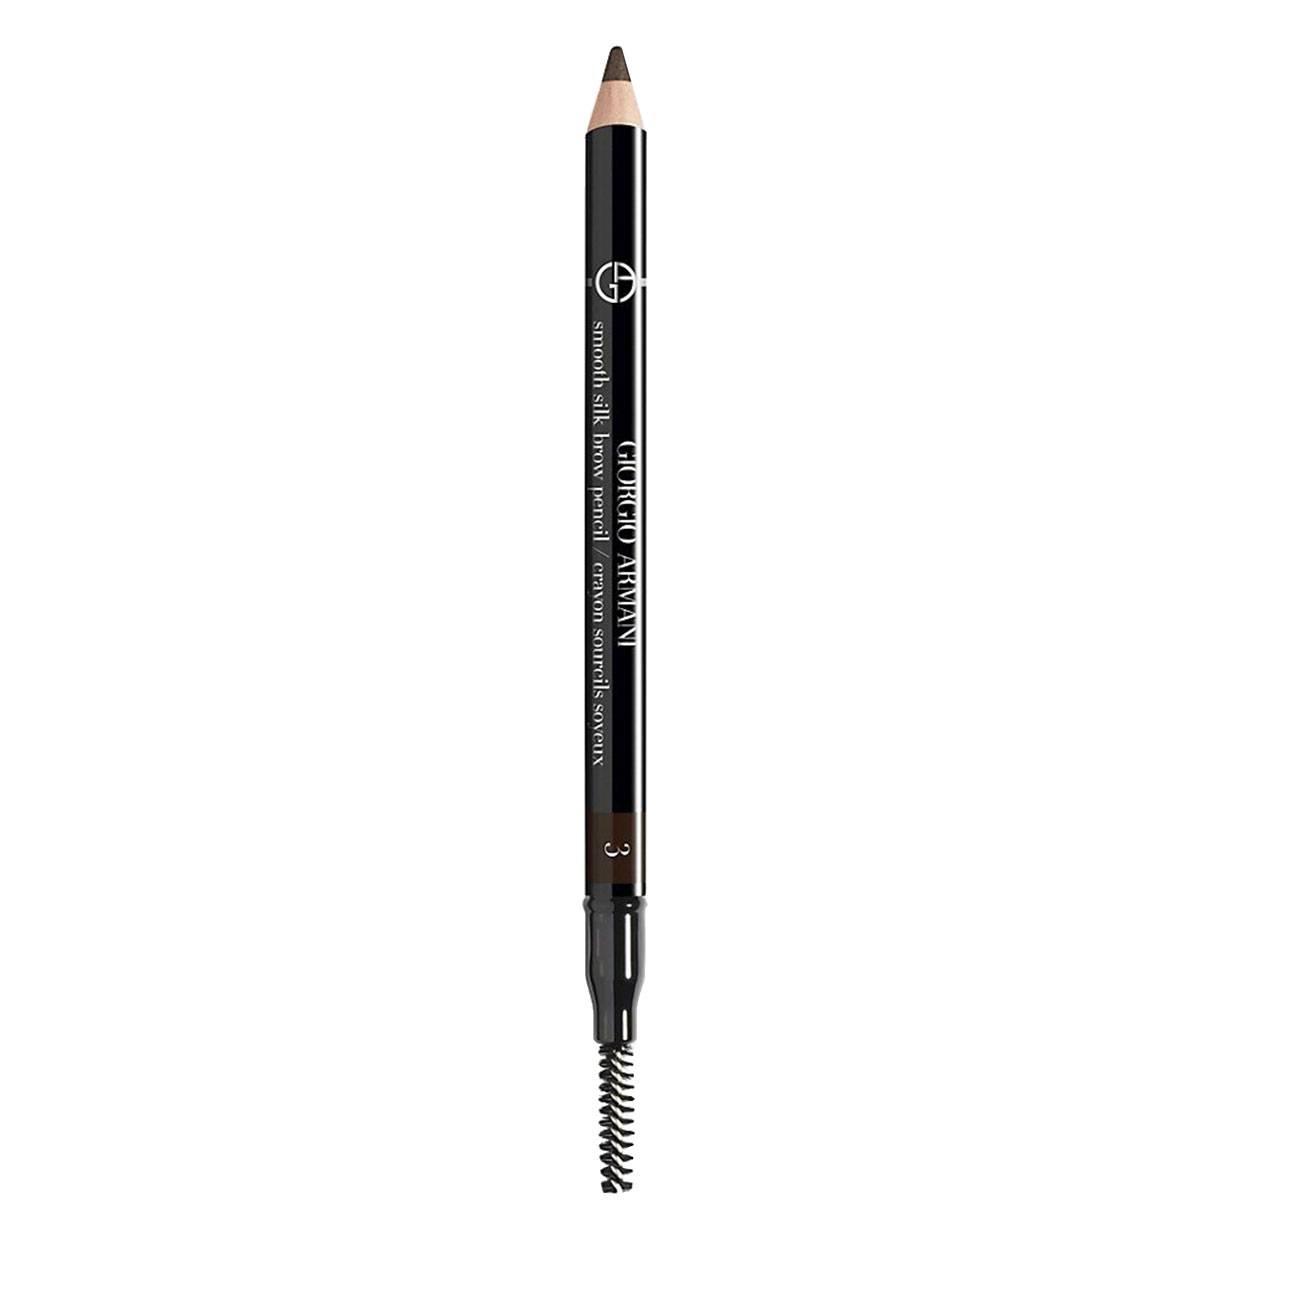 Smooth Silk Eyebrow Pencil 3 1.2gr Giorgio Armani imagine 2021 bestvalue.eu